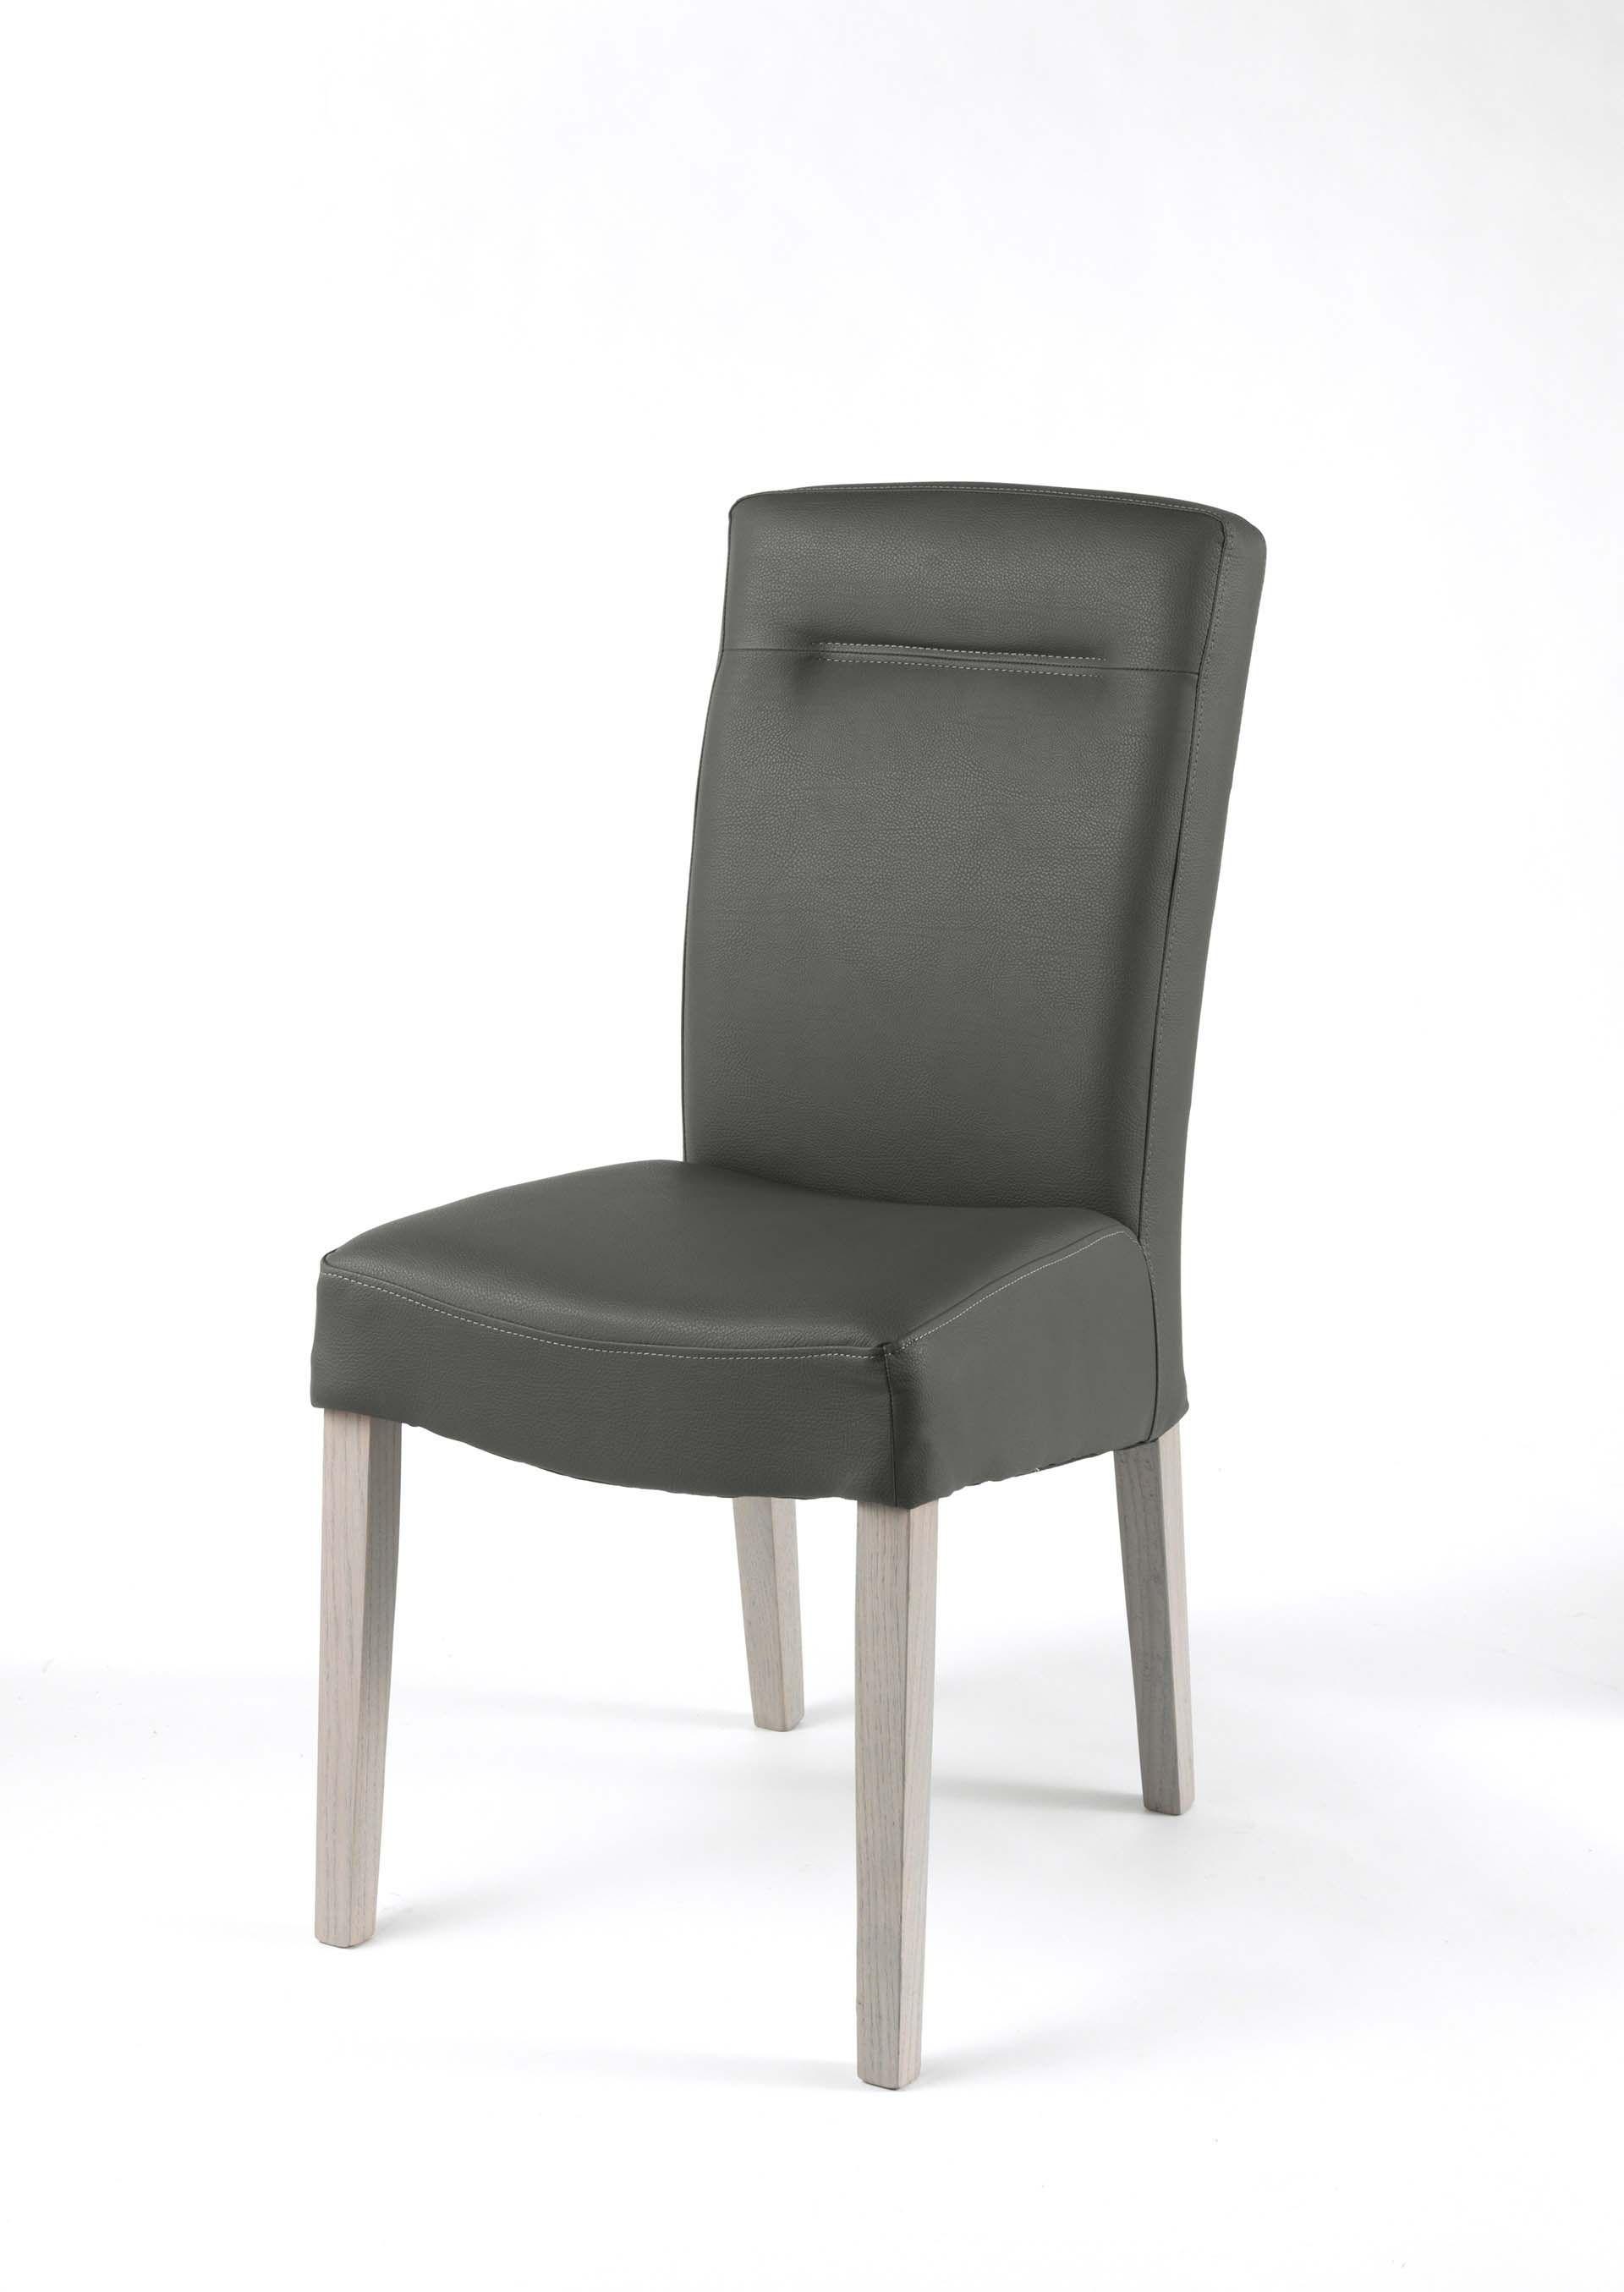 Nathan En Anthracite Confortable Chaise Cuir Simili Coloris 8n0OkPwX